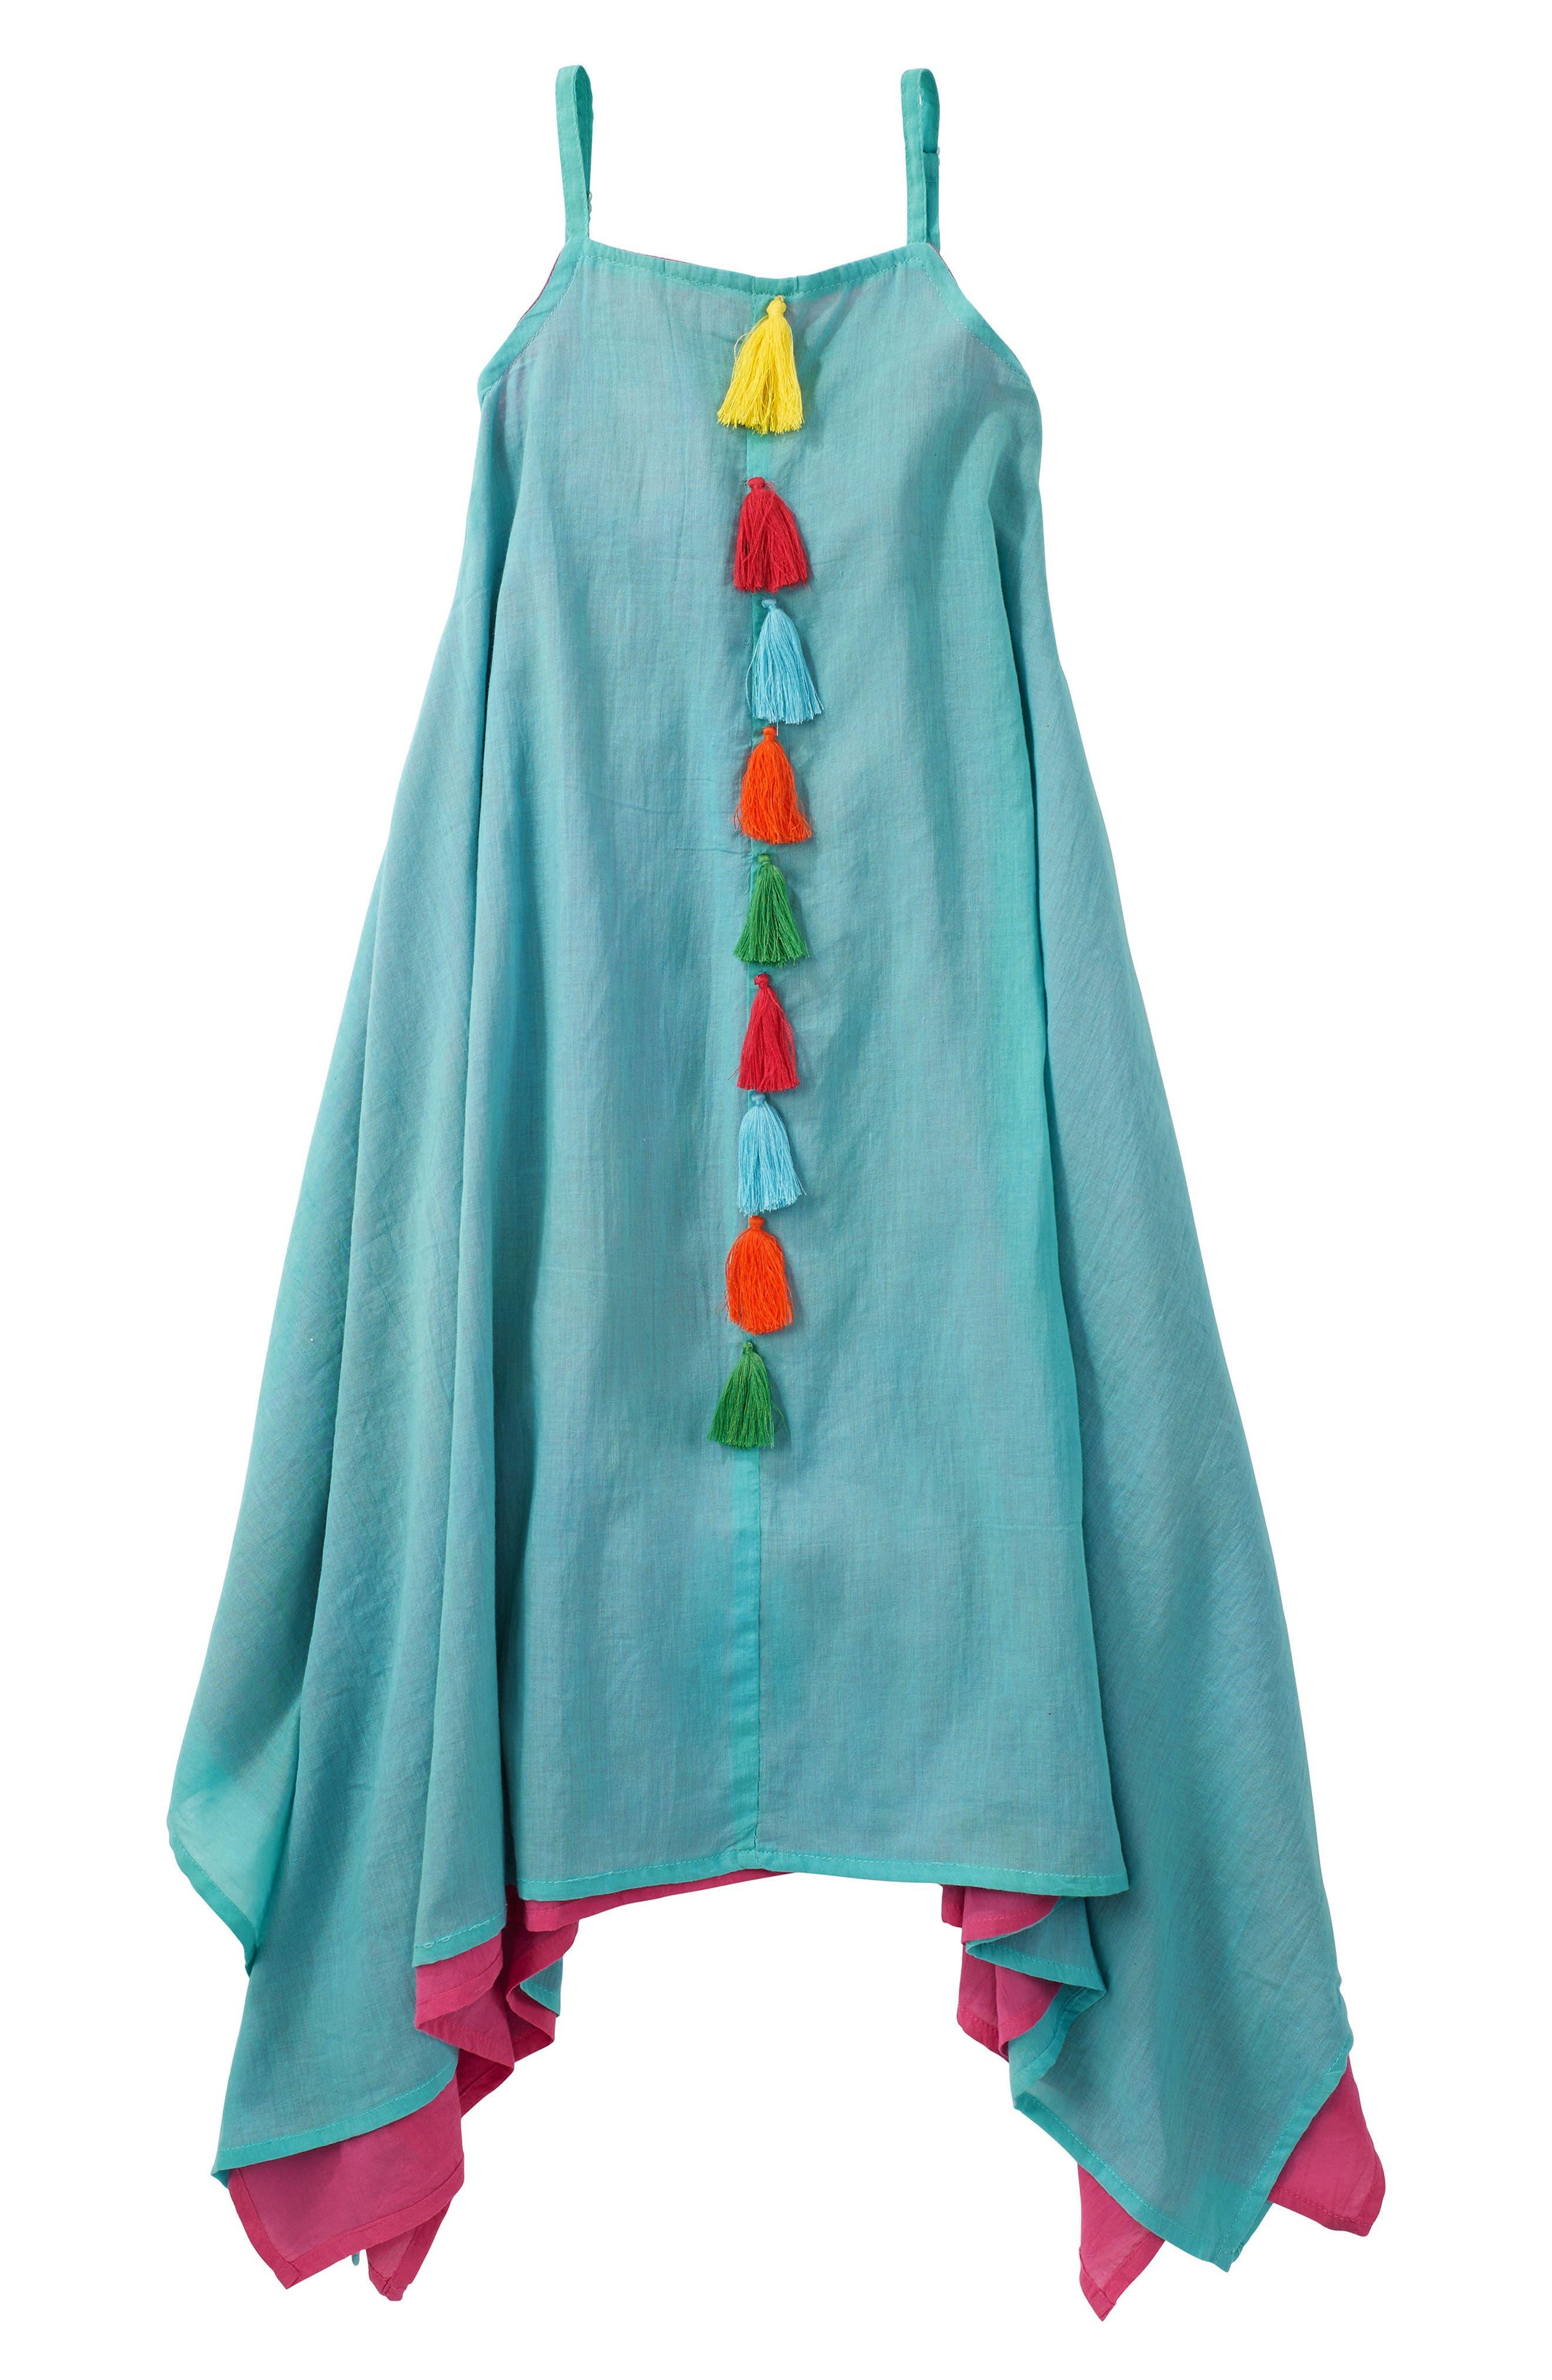 Alternate Image 1 Selected - Masalababy Citra Tassel Dress (Toddler Girls)